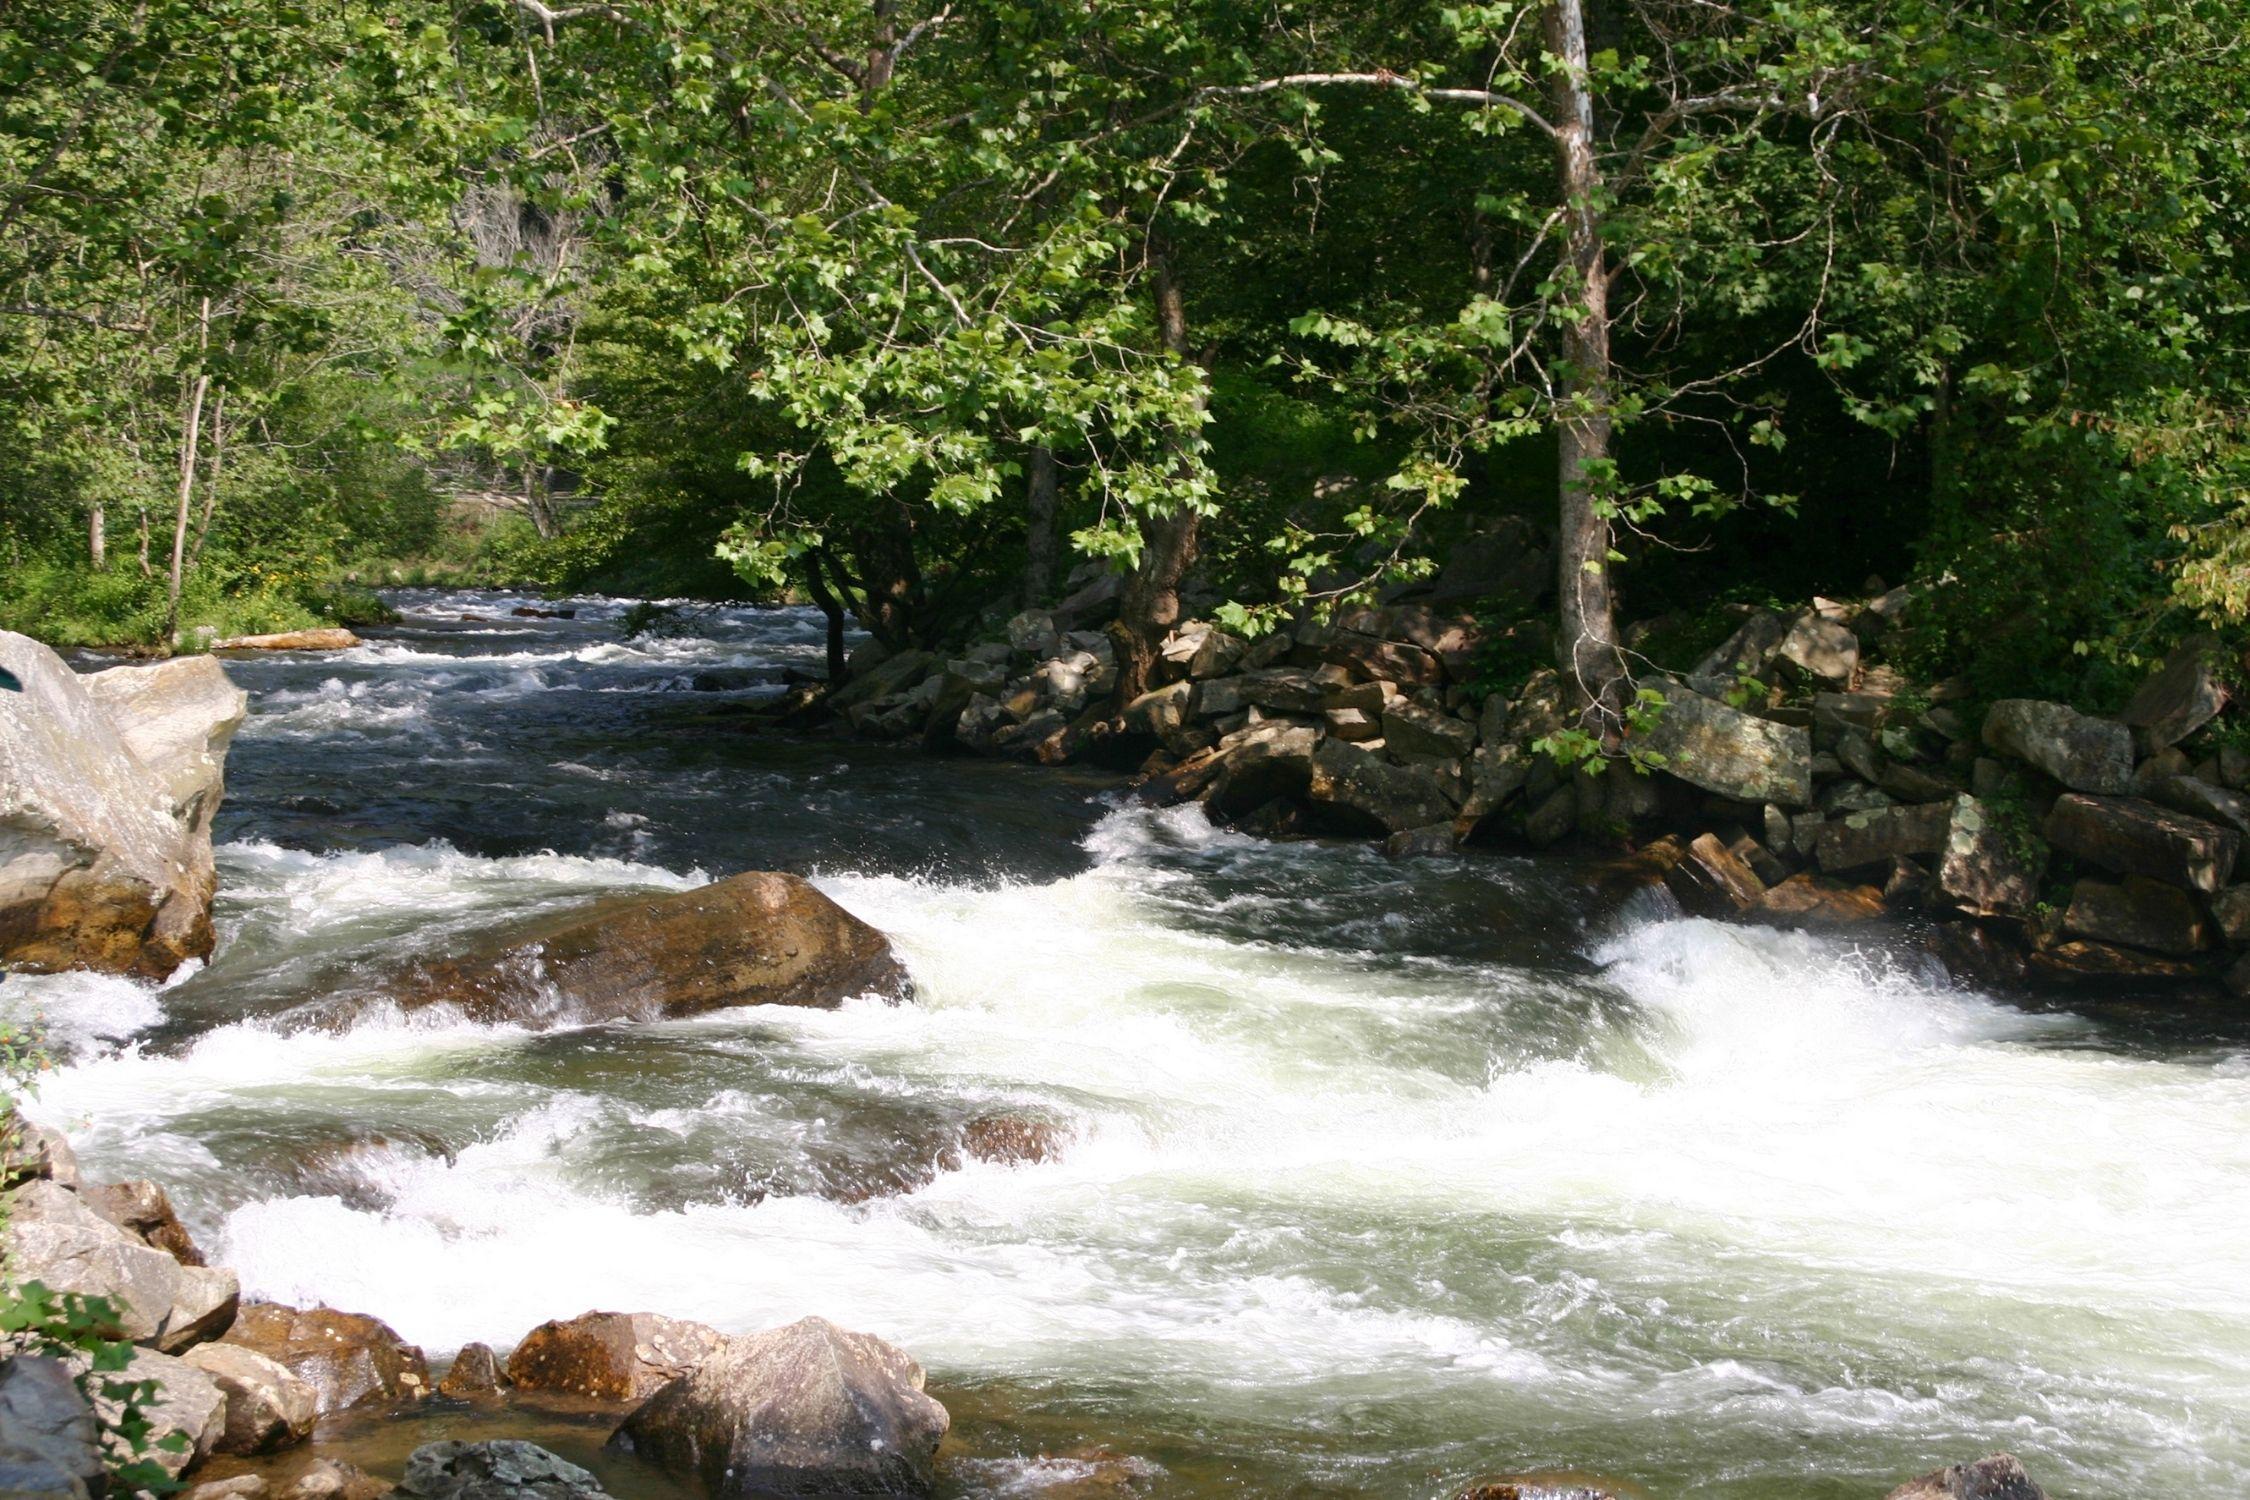 Rapids on the Nantahala River